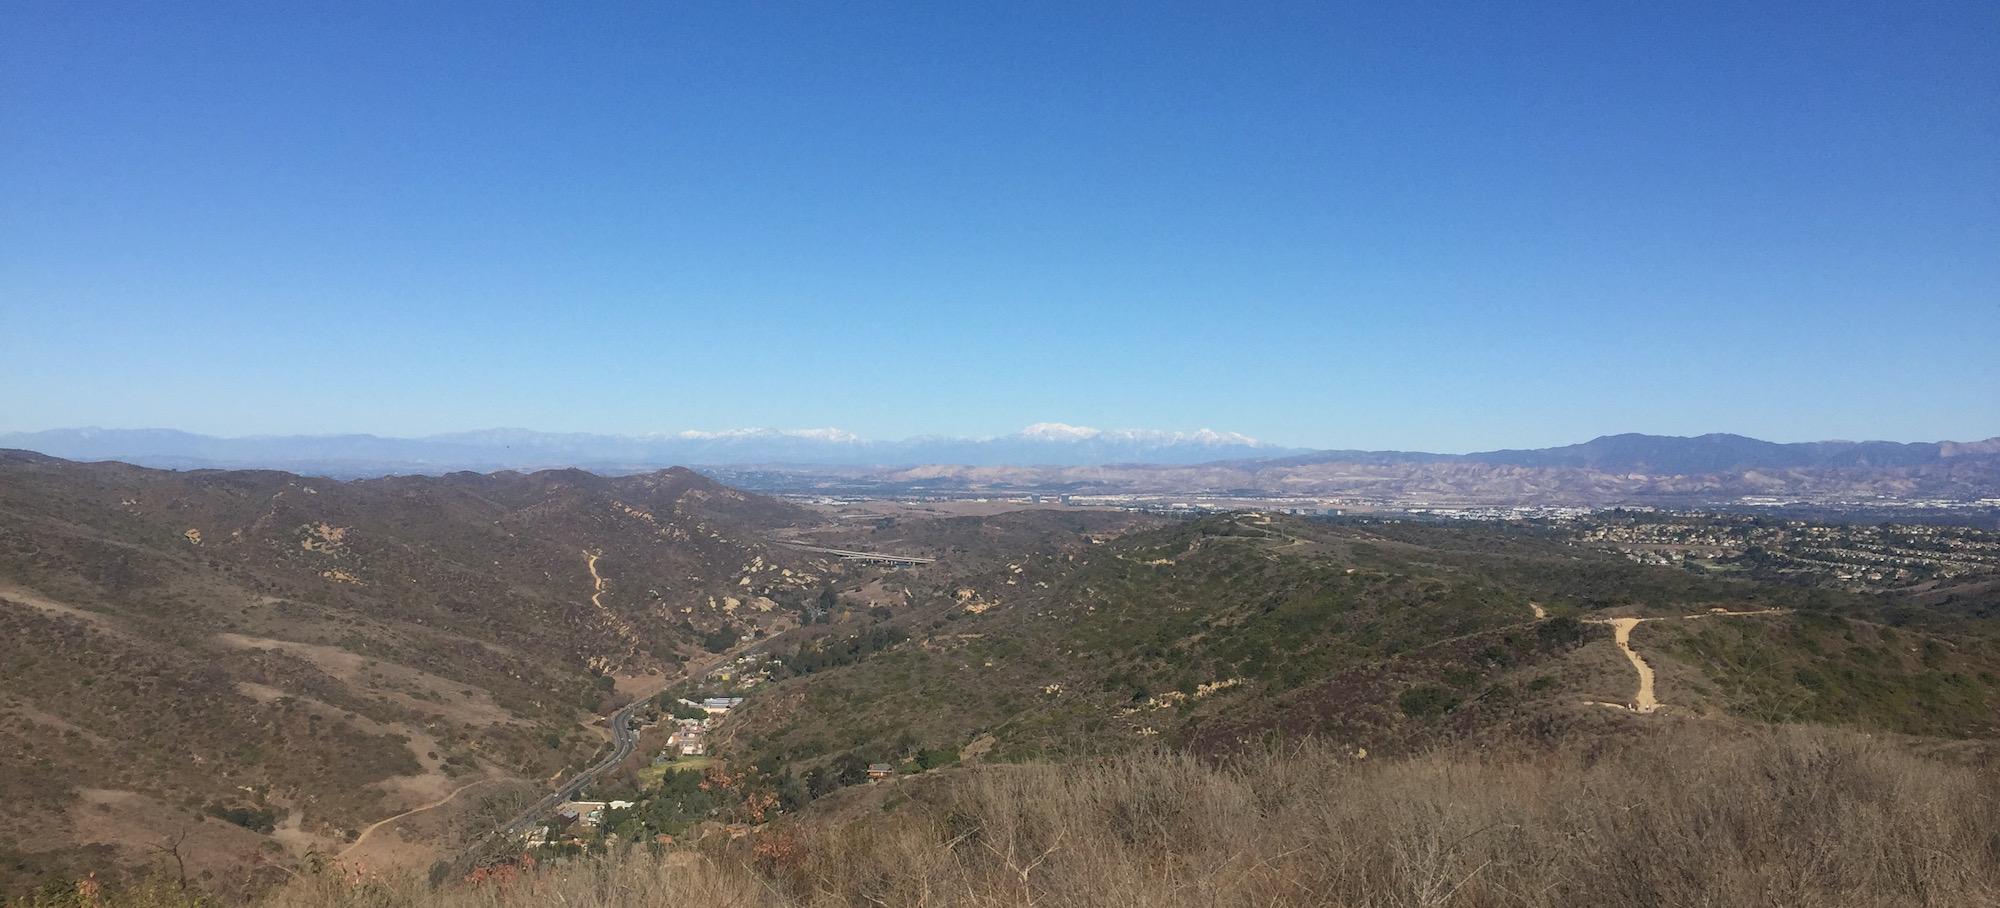 Views of Mount Baldy from Laguna Beach Mountains